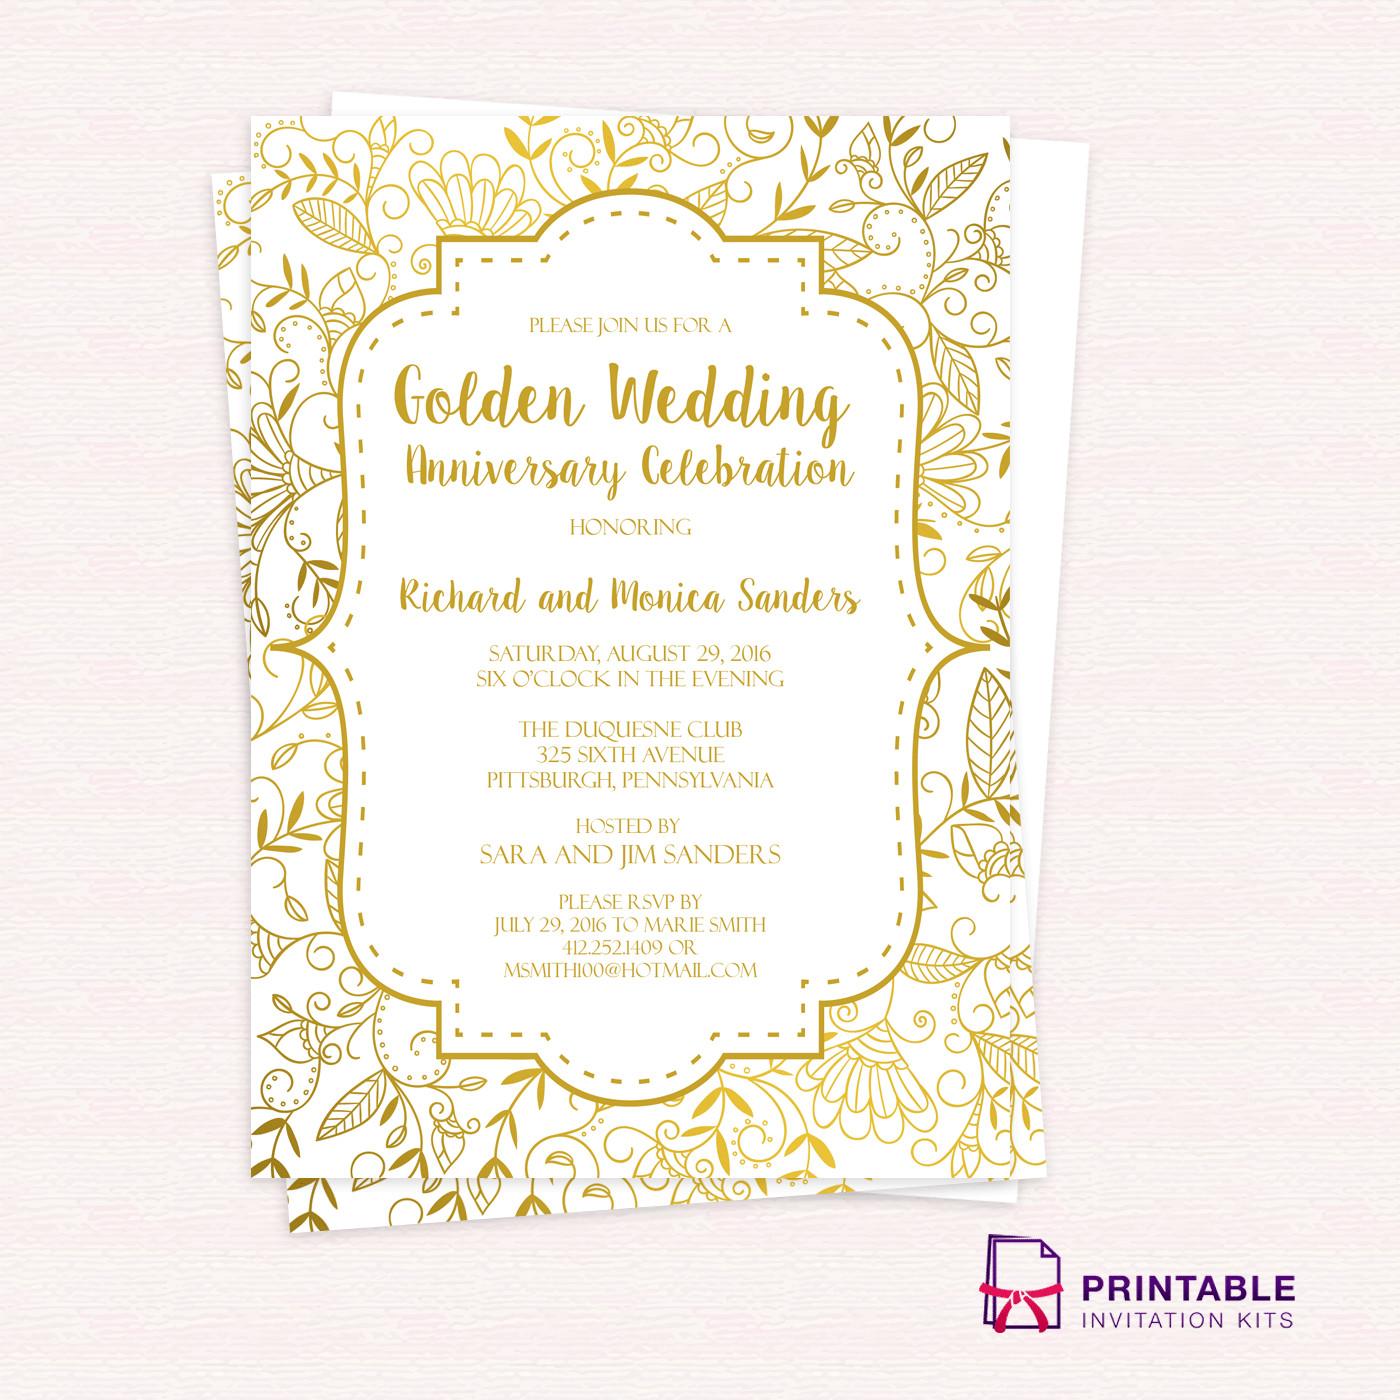 50th Anniversary Invitations Templates Golden Wedding Anniversary Invitation Template